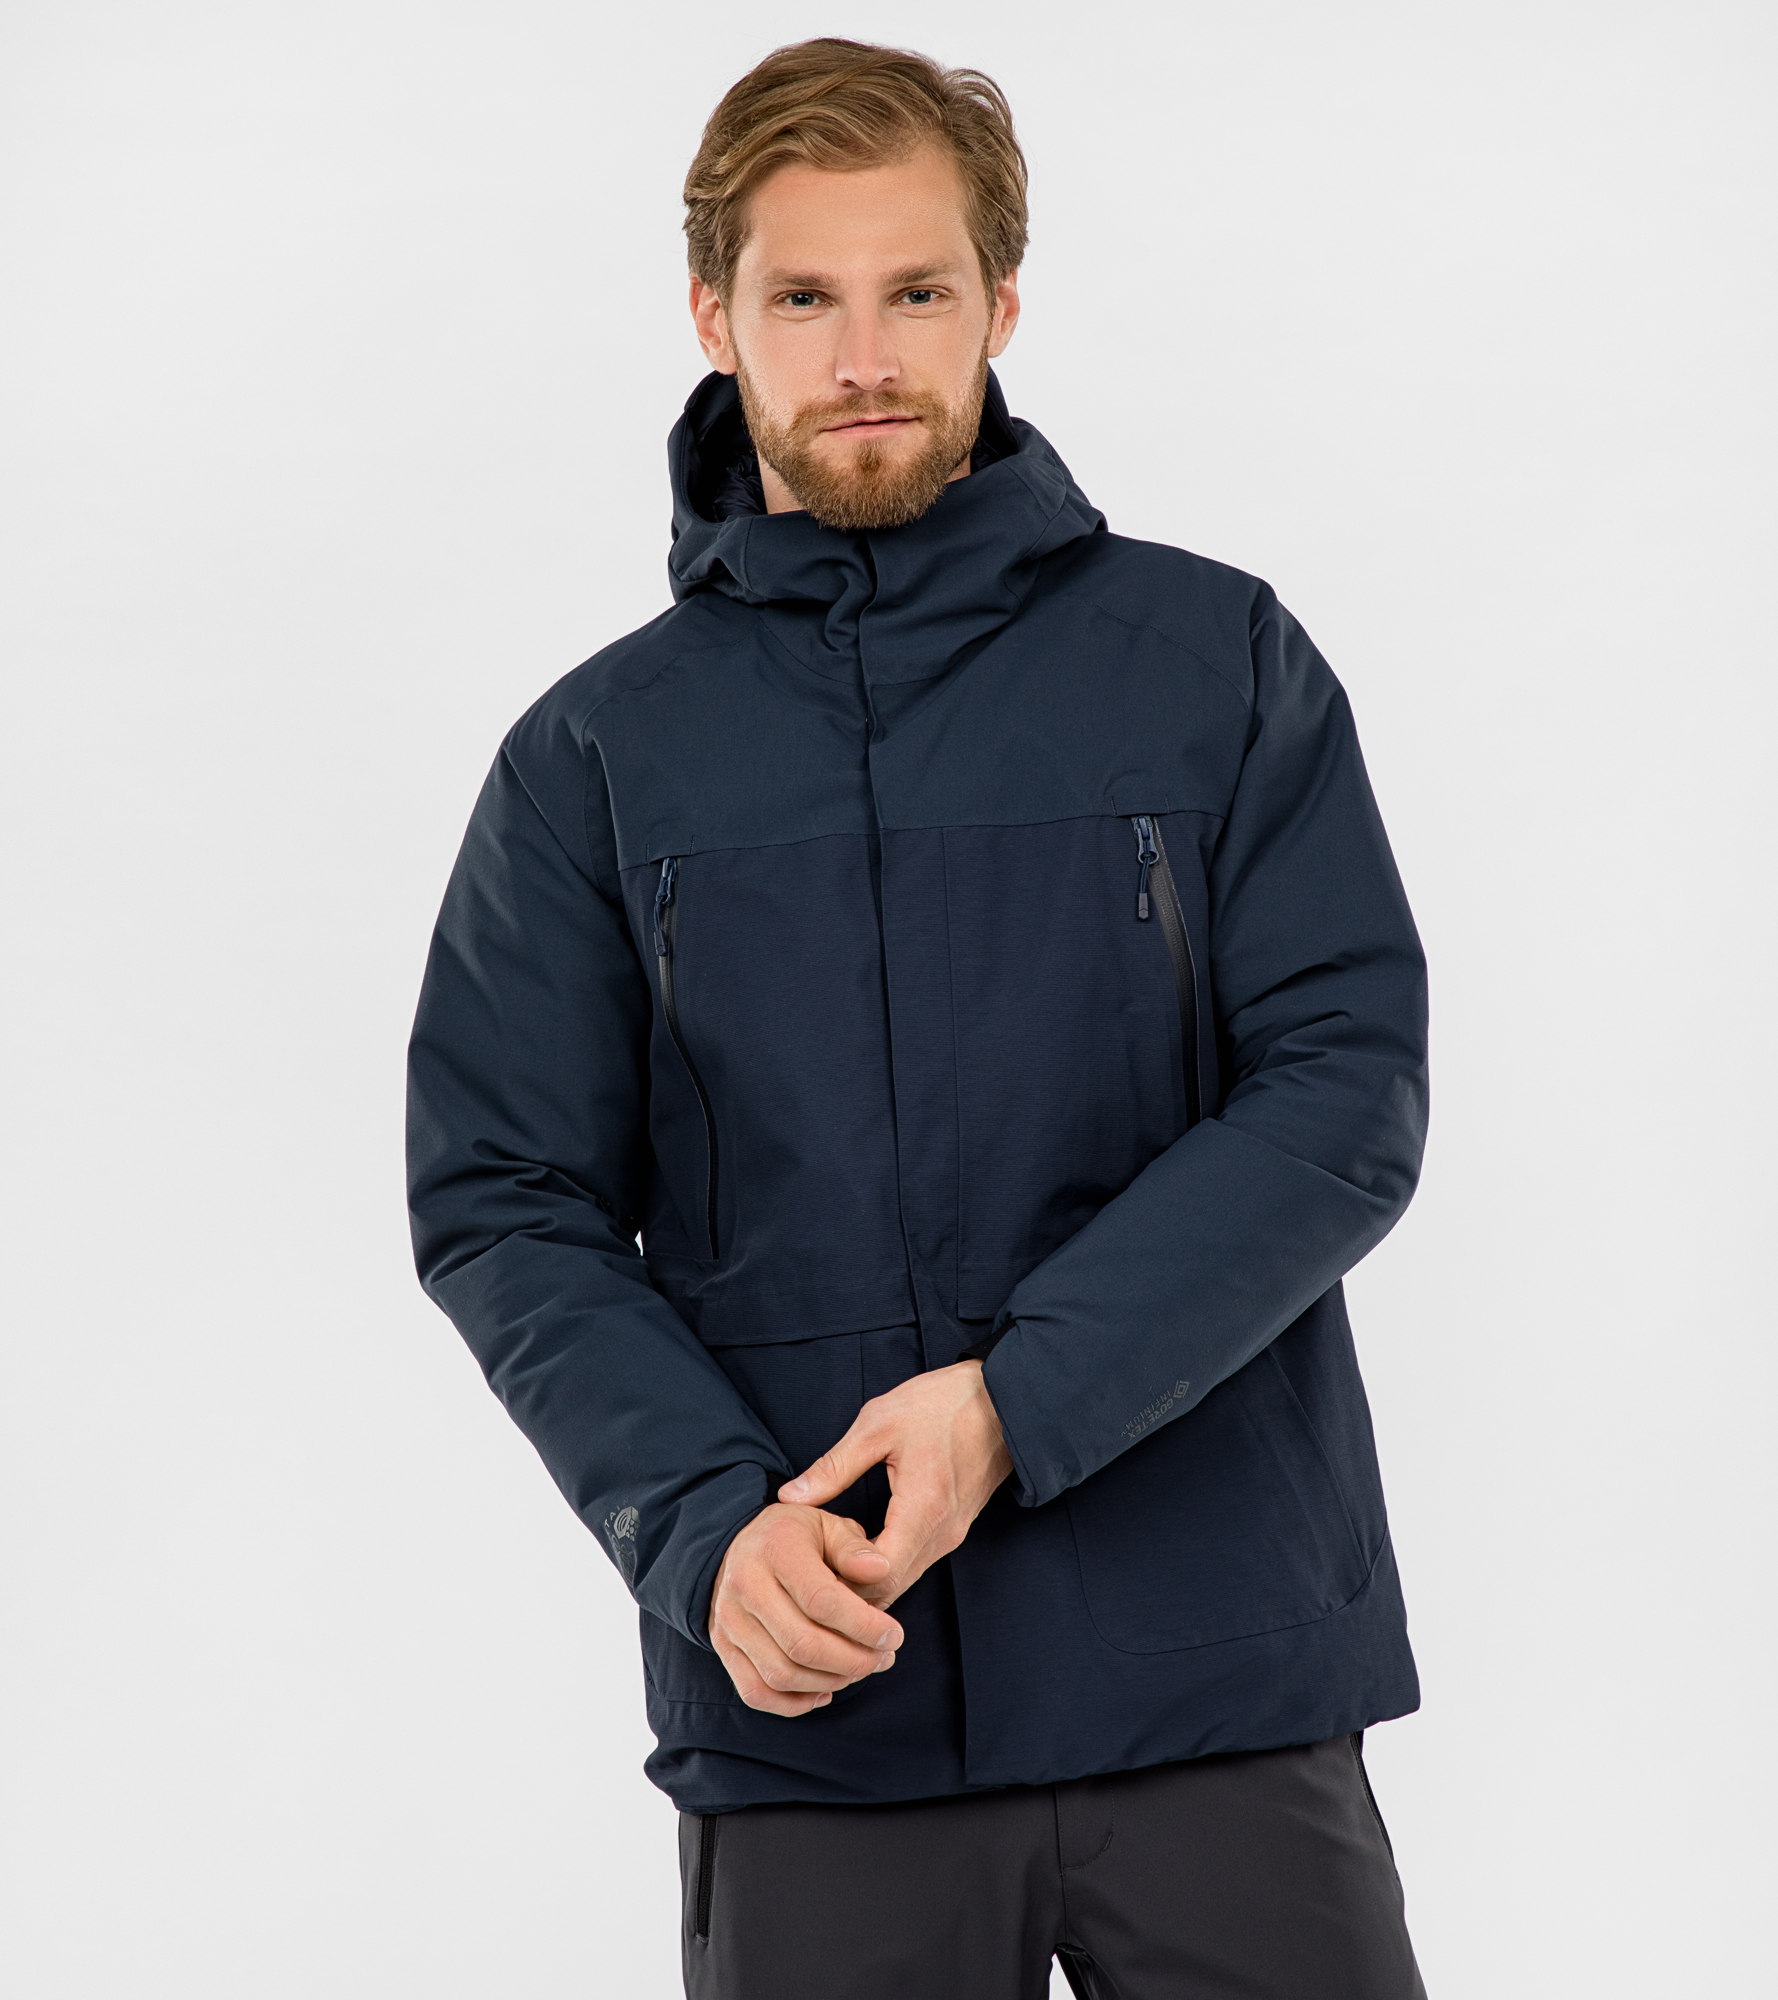 Mountain Hardwear Куртка утепленная мужская Hardwear, размер 56